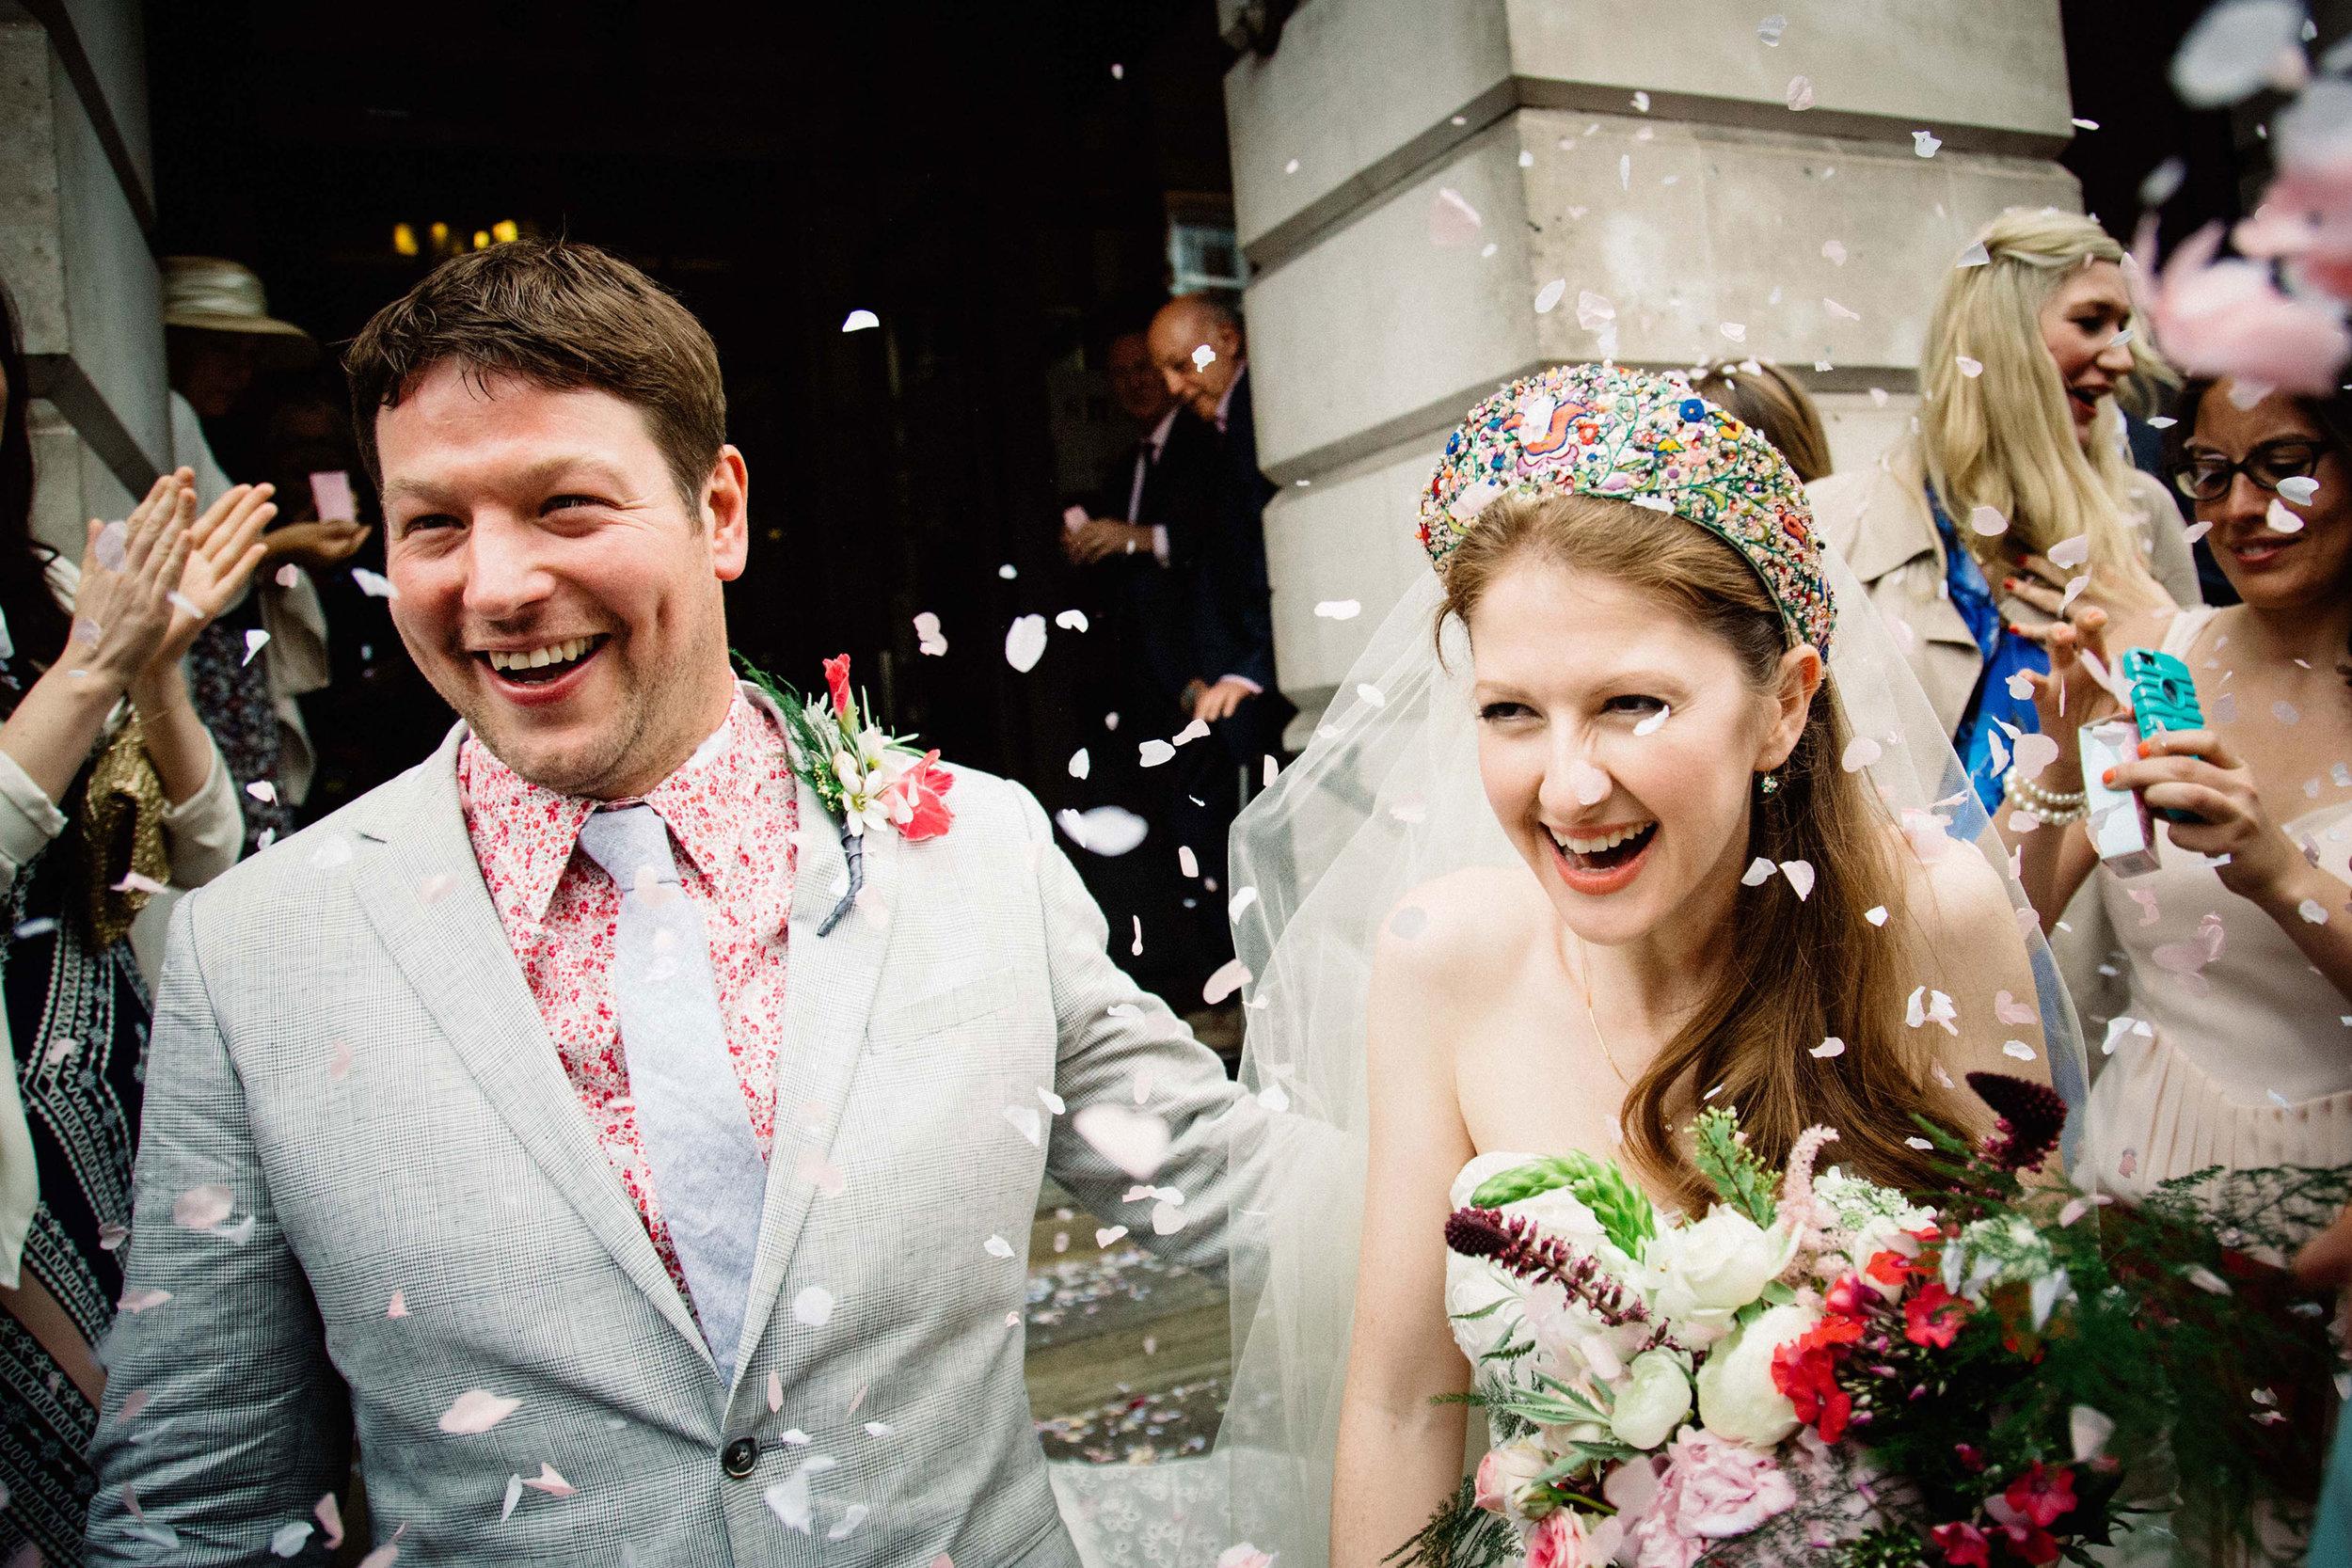 Ele-and-Matts-wedding---Michael-Newington-Gray-156.jpg